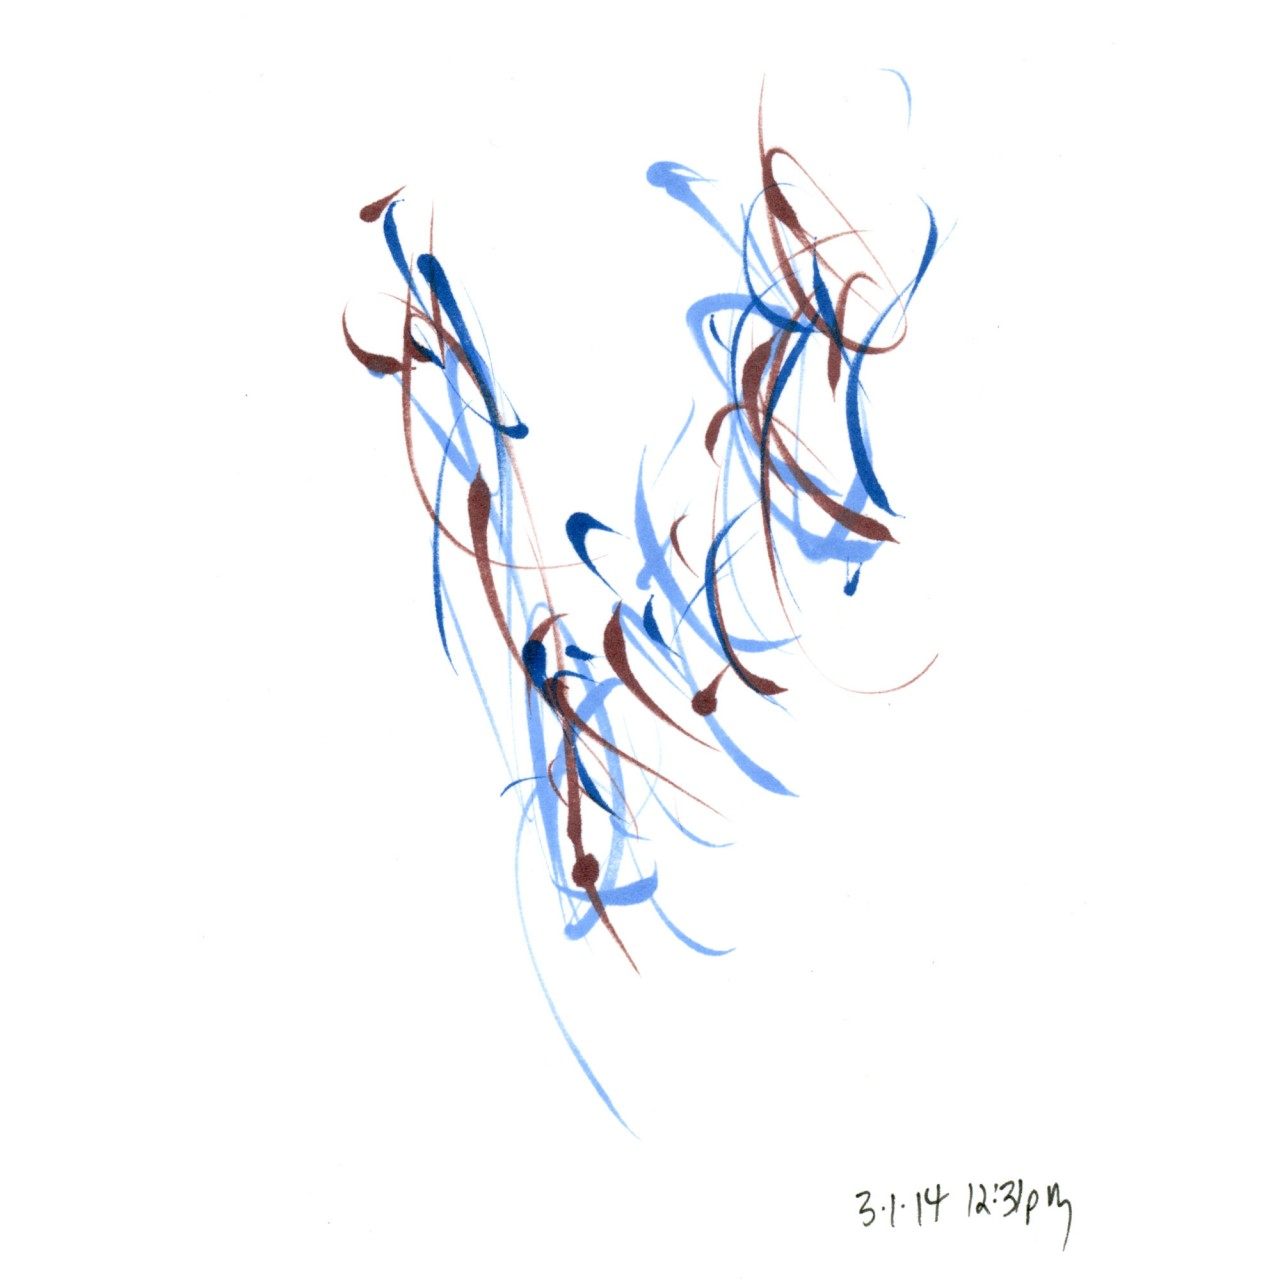 2014-03-01_12-31pm